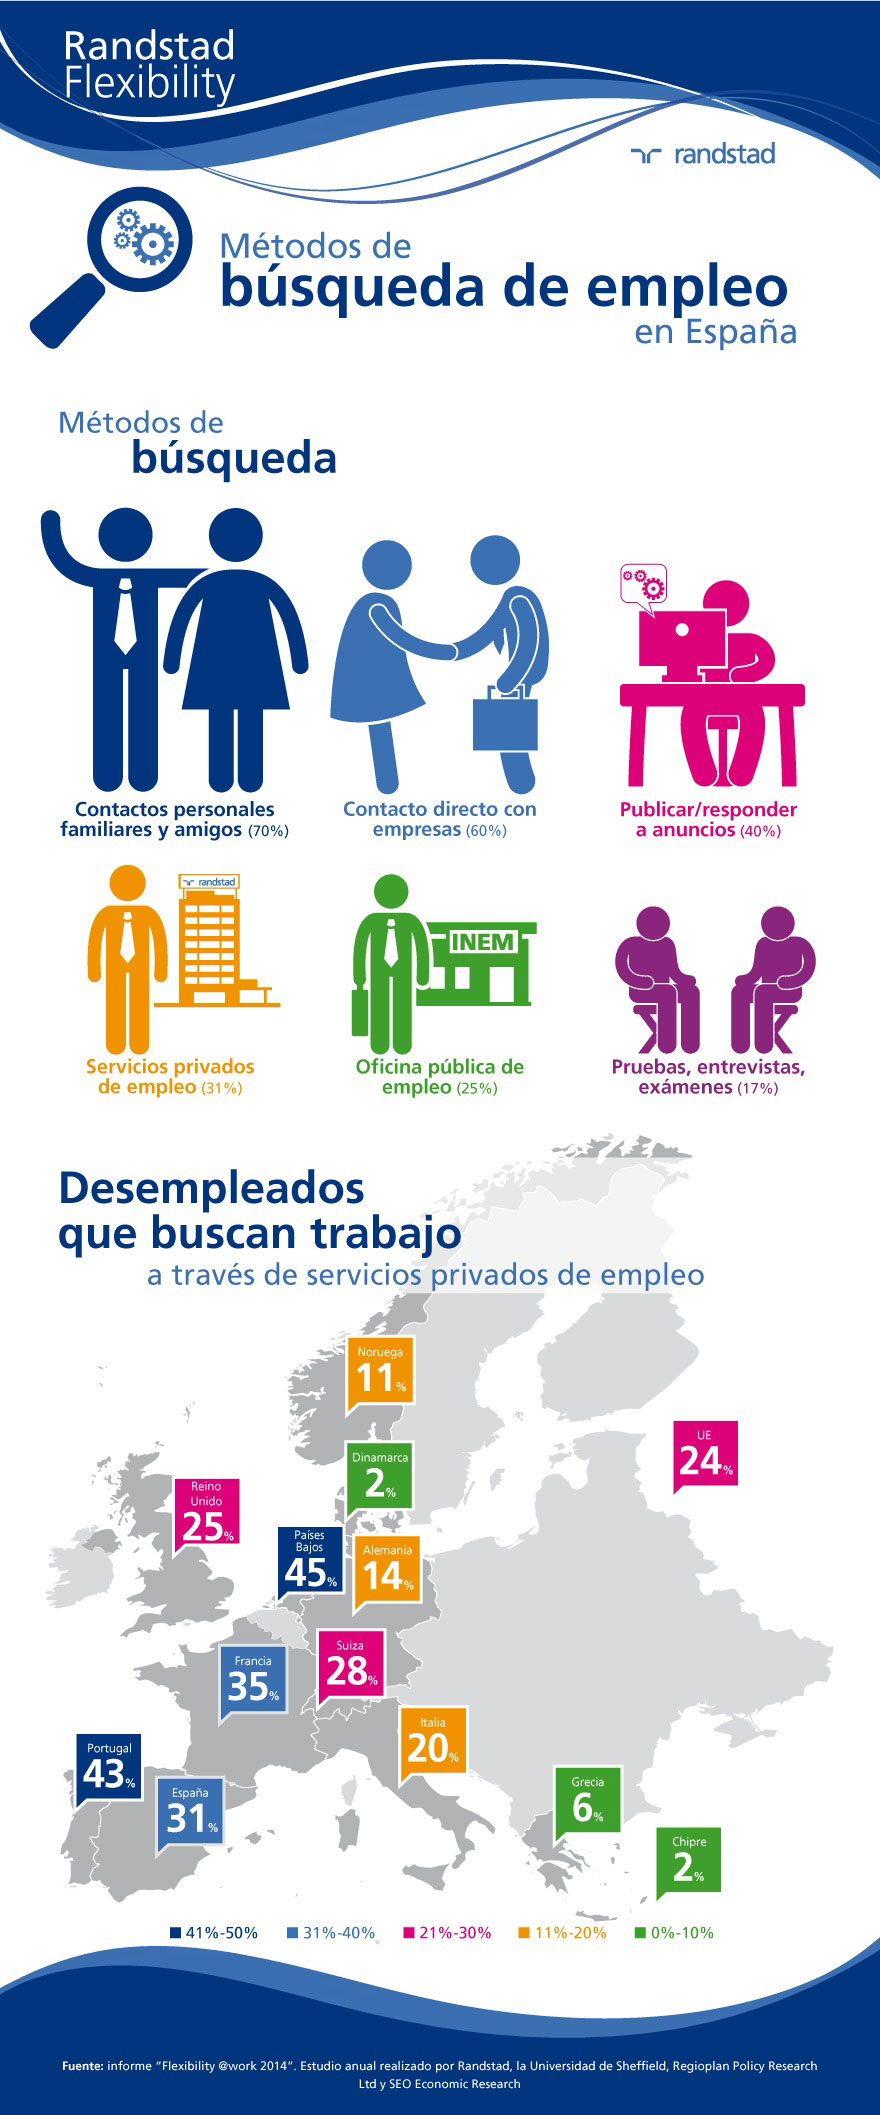 randstad-flexibility-infografia-flexibility-2014-busqueda-empleo.jpg